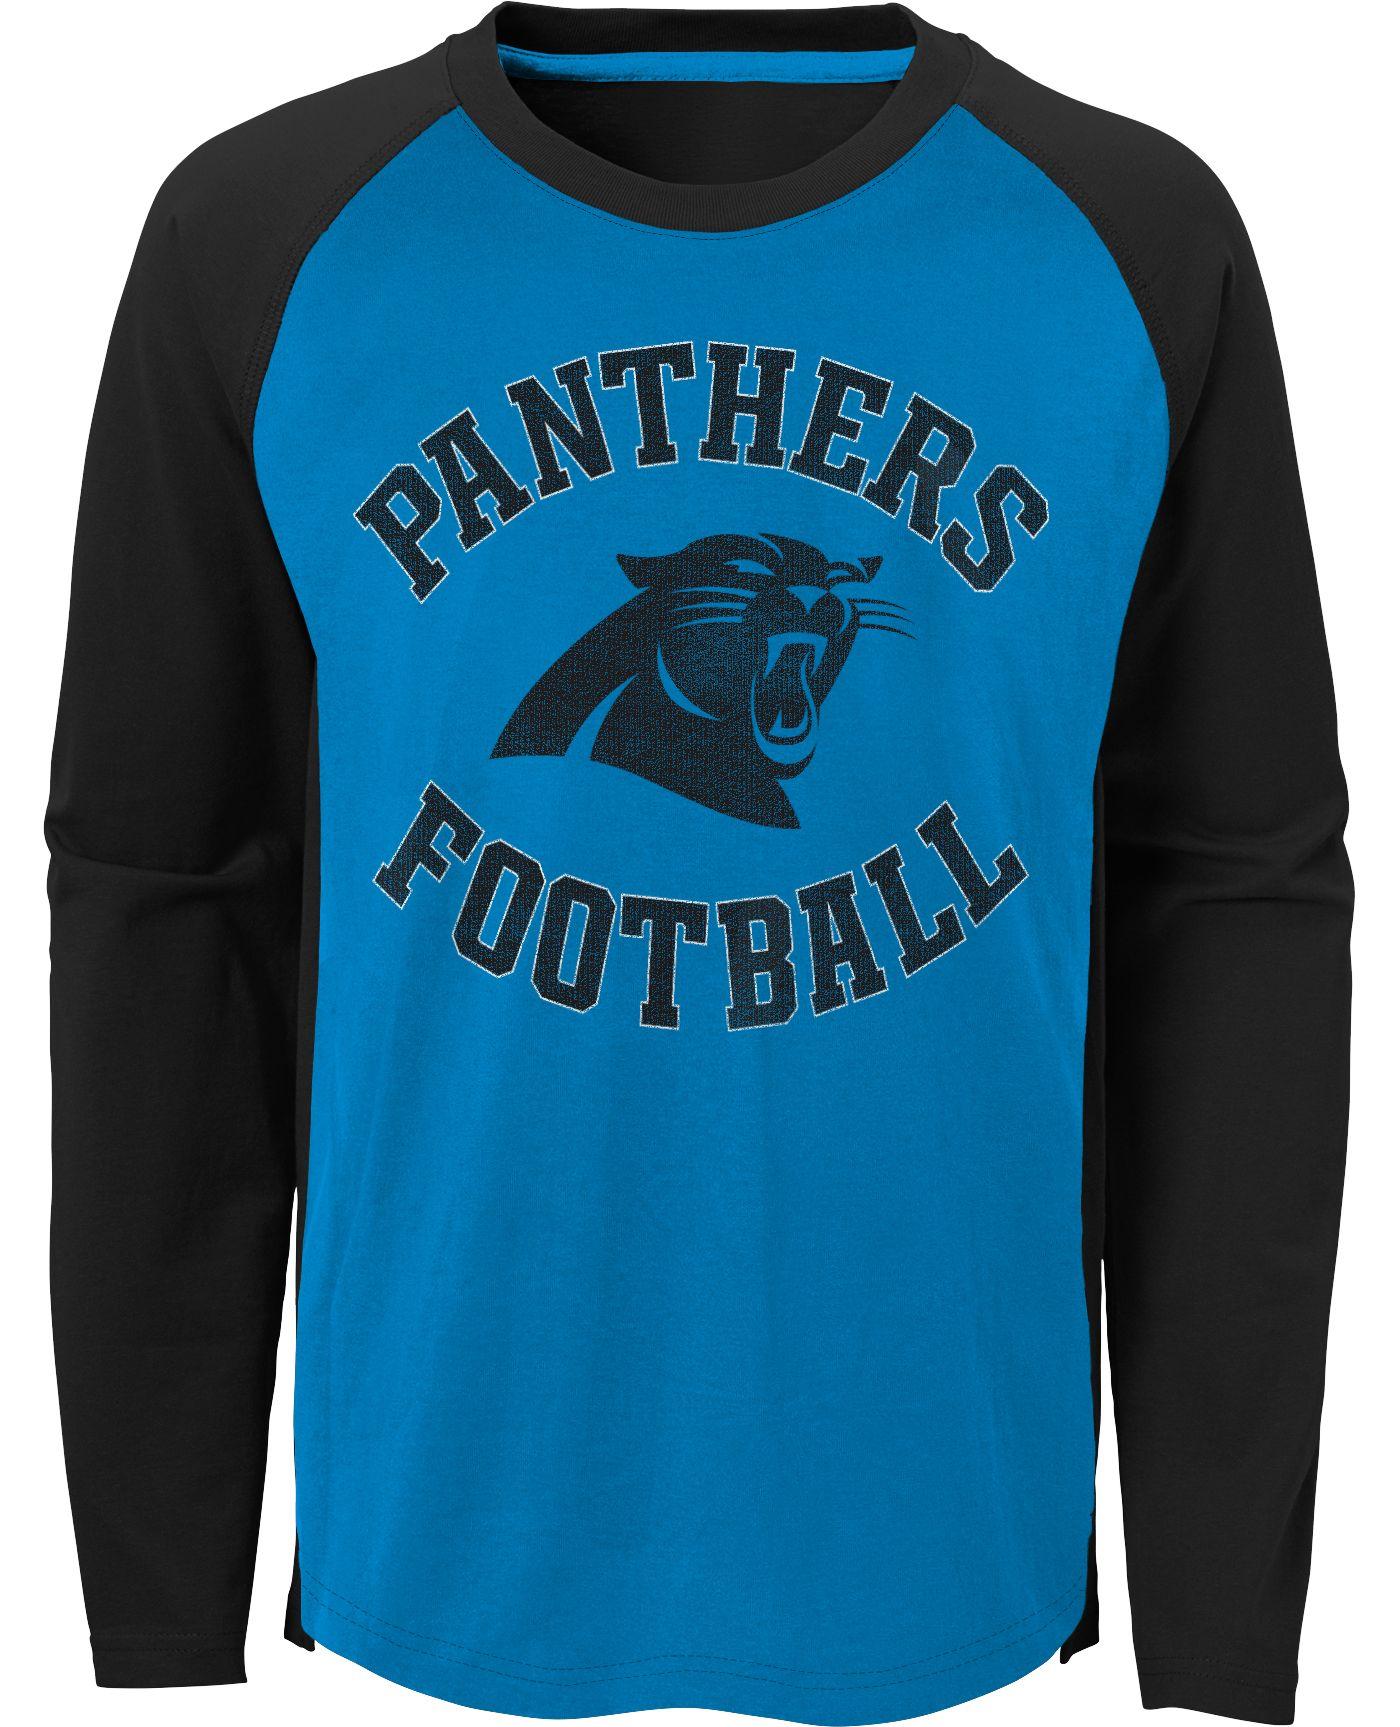 NFL Team Apparel Youth Carolina Panthers Air Raid Long Sleeve Black Shirt